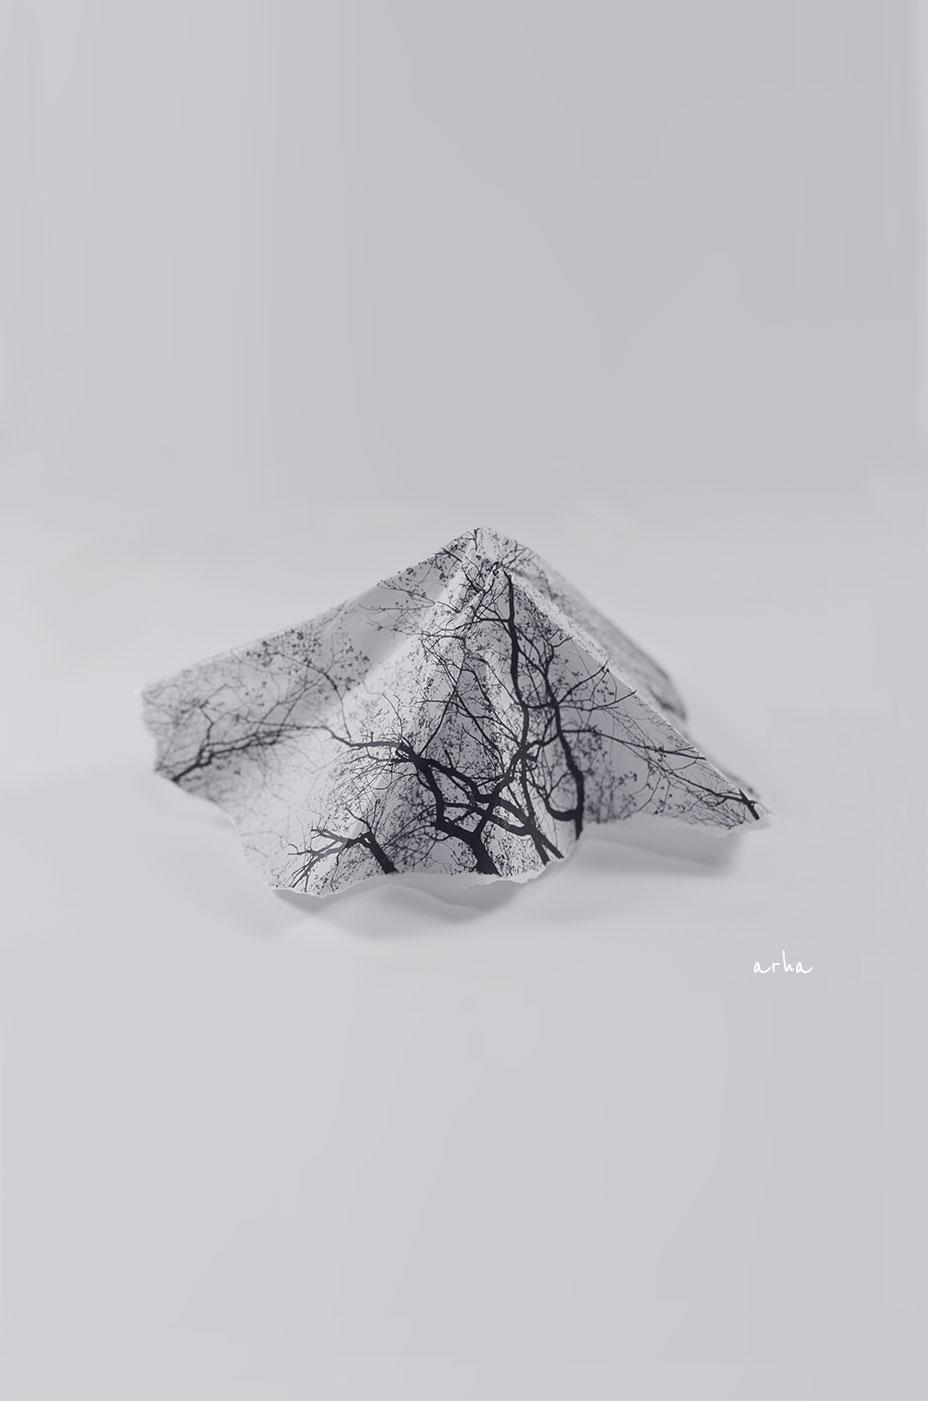 Little-mountain-copyright-2012-arha-Tomomichi-Morifuji